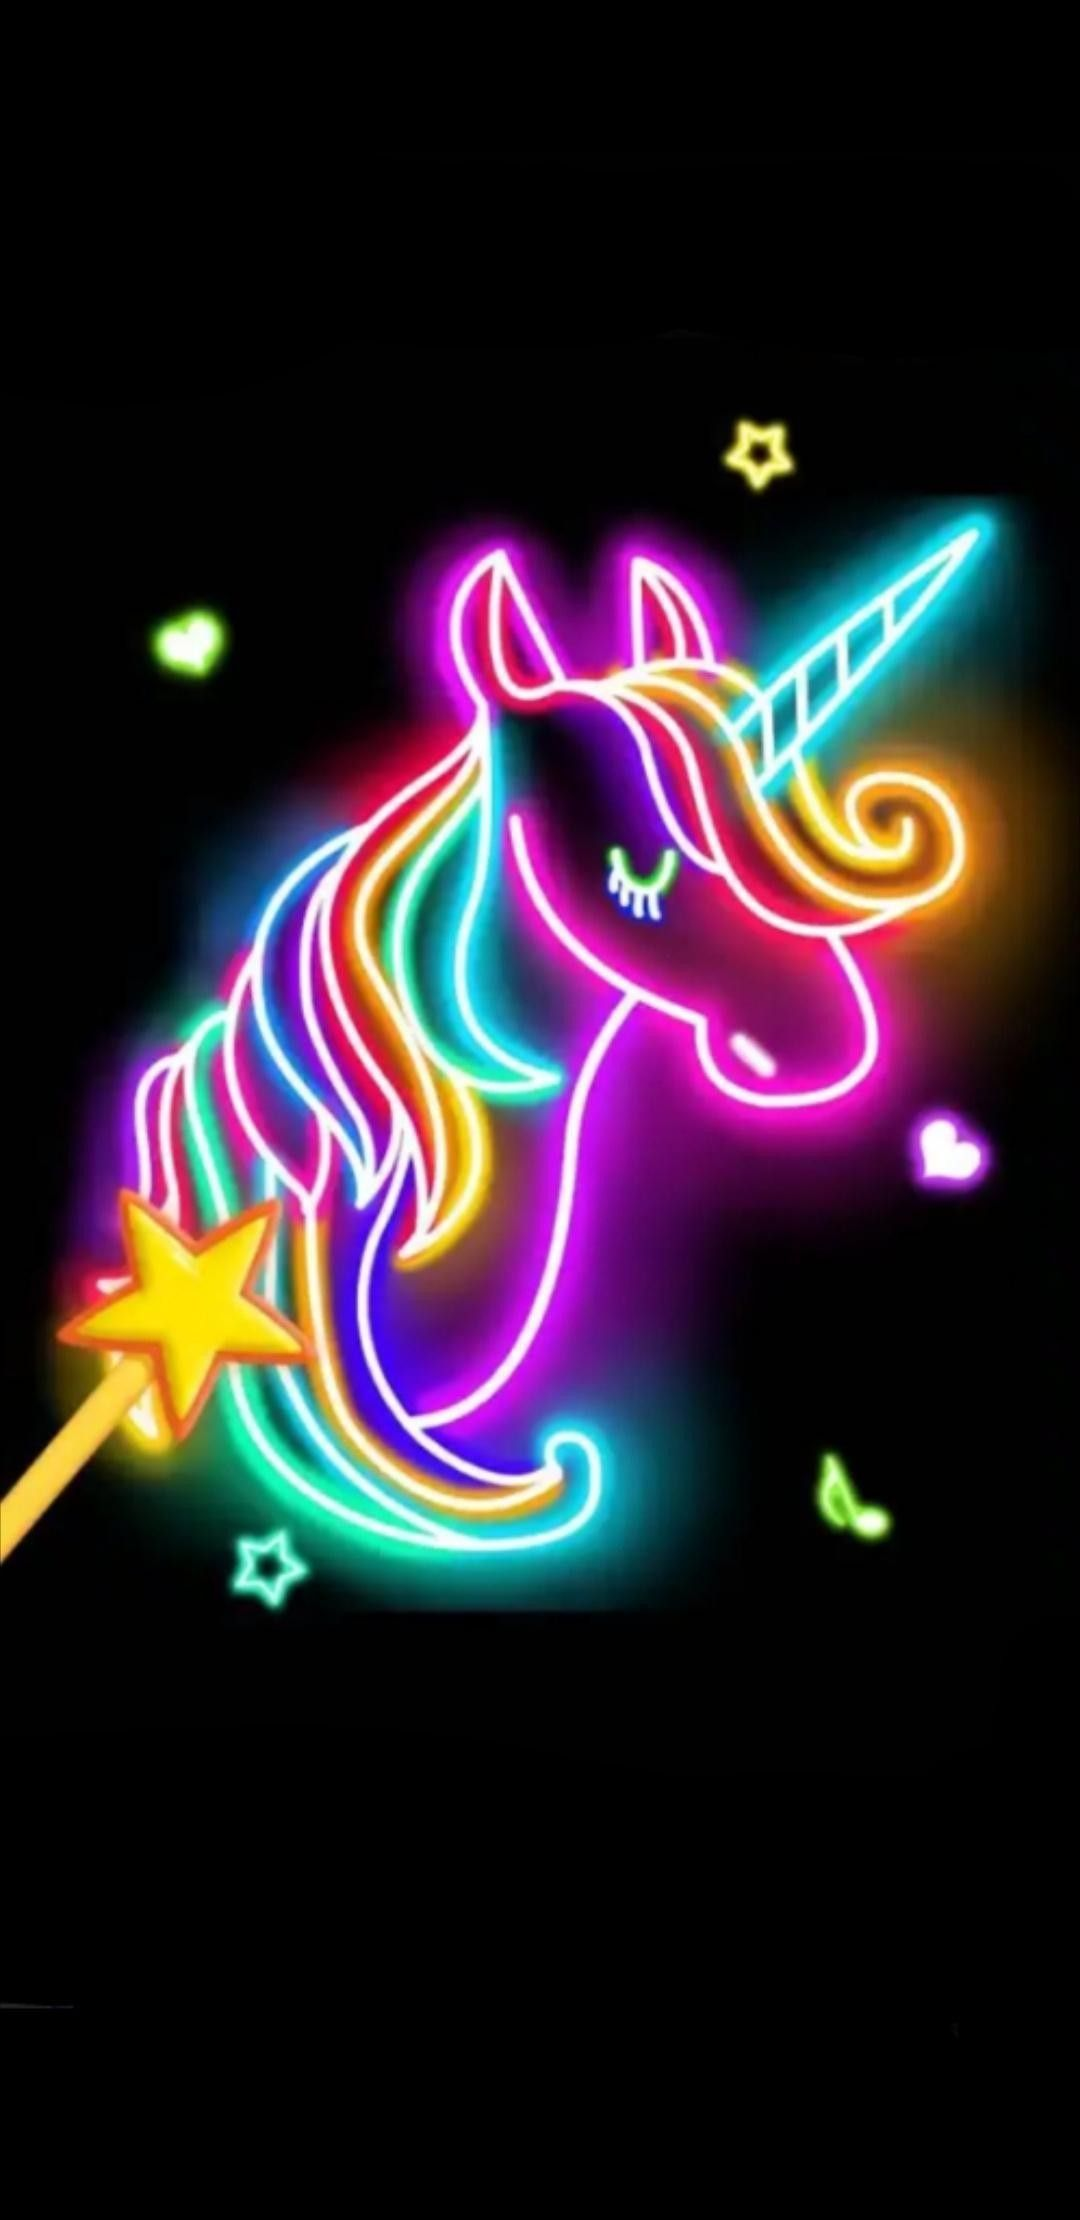 Neon Unicorn Wallpapers Top Free Neon Unicorn Backgrounds Wallpaperaccess